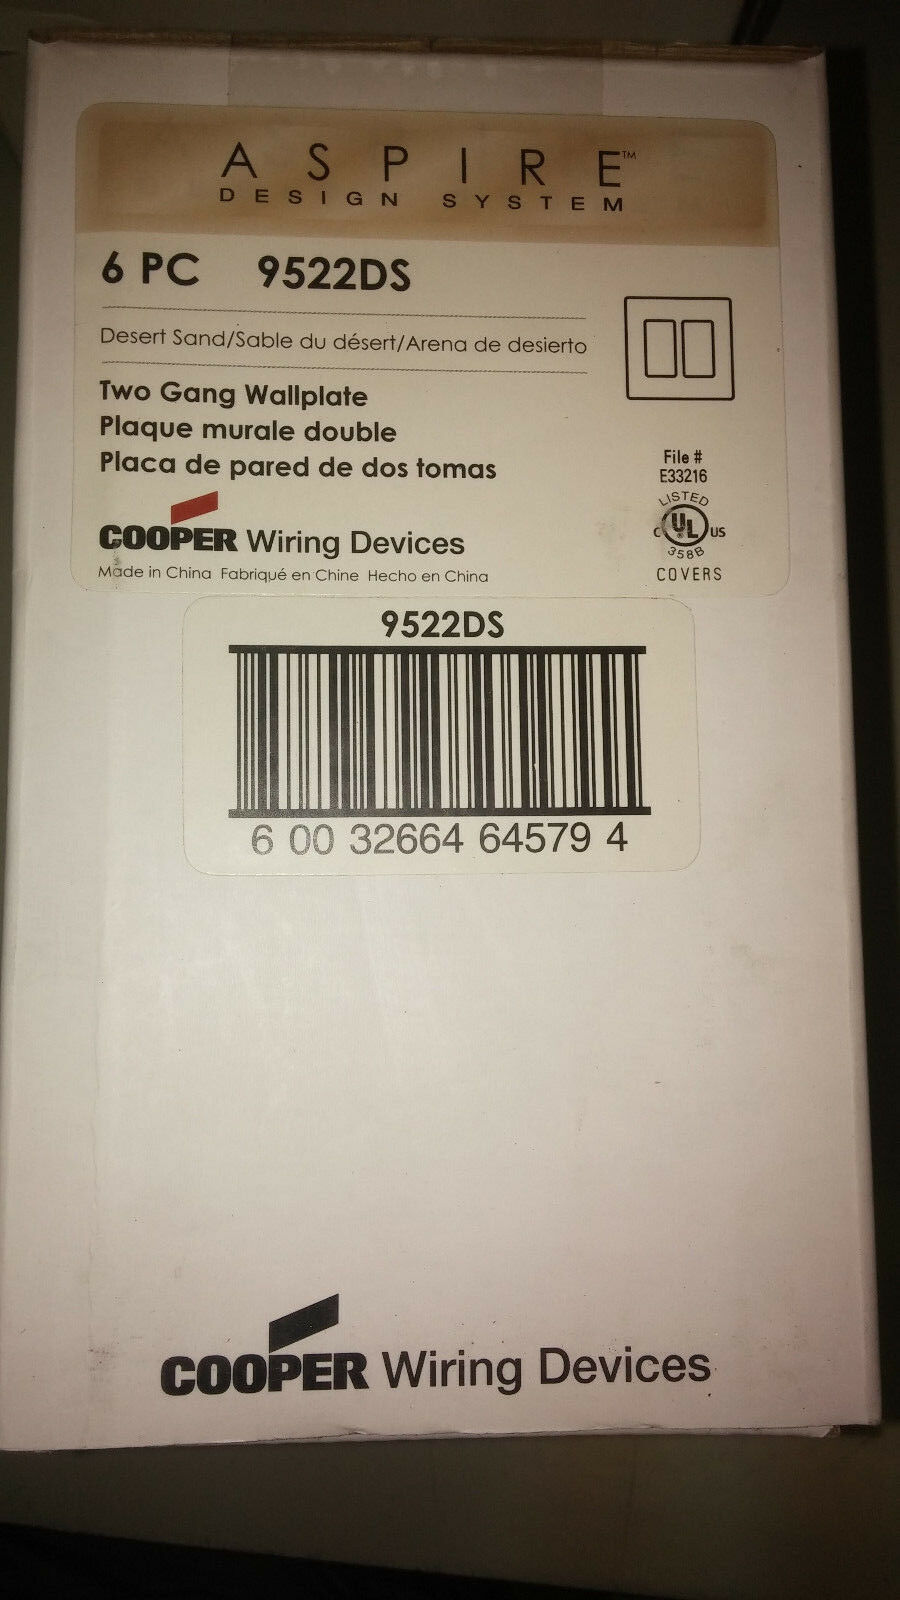 Cooper Wiring Devices Aspire Design 9522ds 2g Screwless Des Sand Norton Secured Powered By Verisign